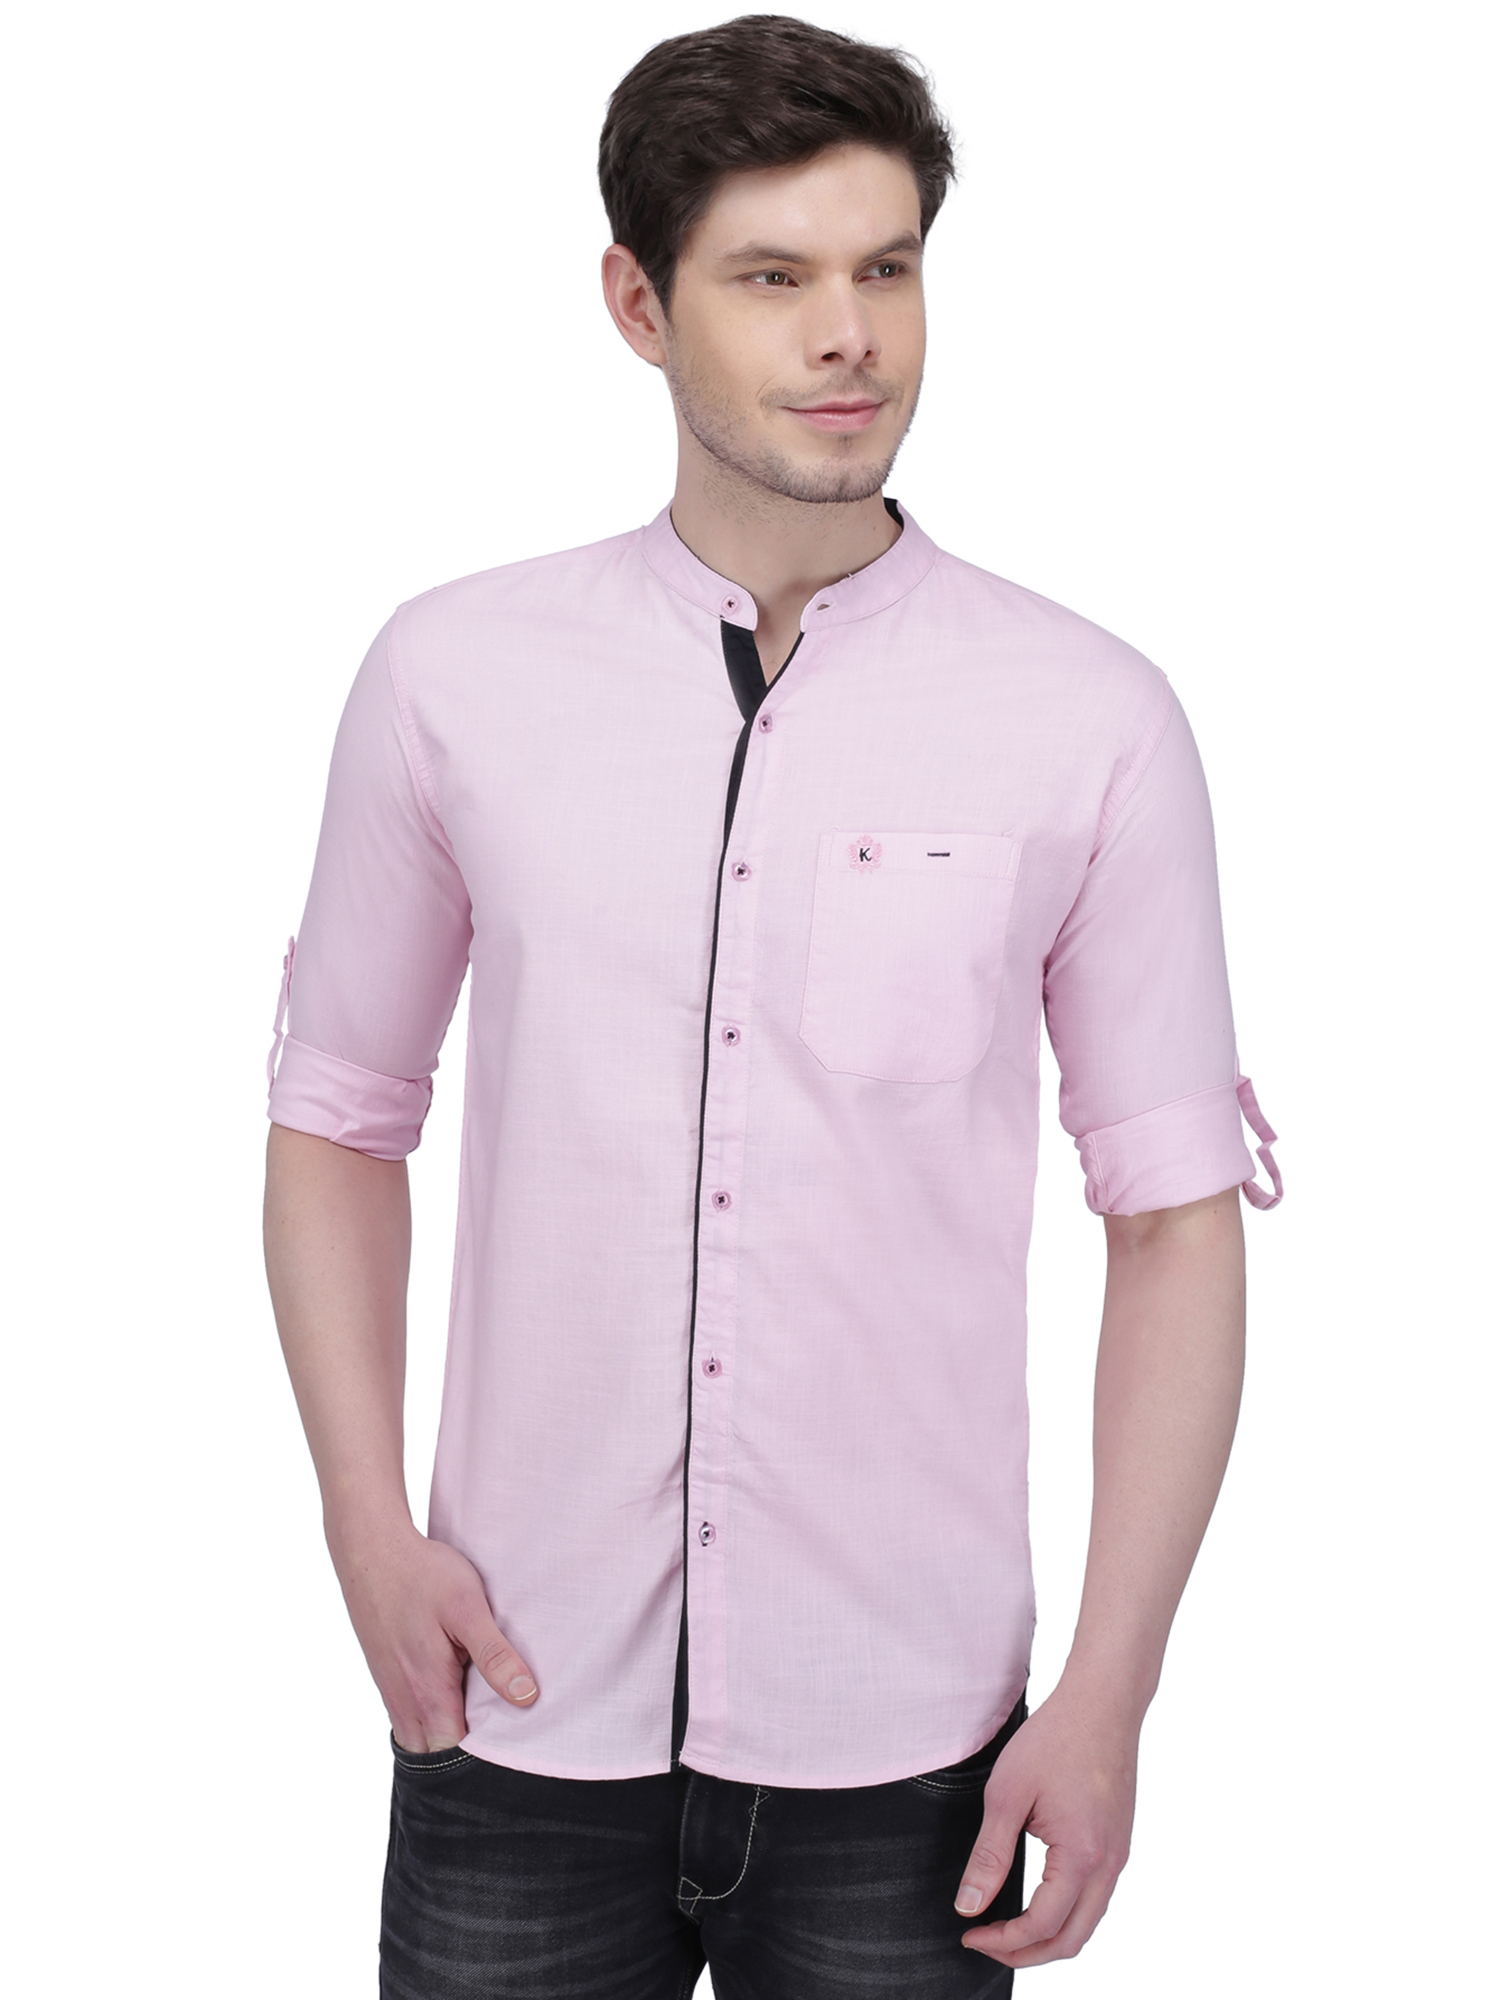 Kuons Avenue   Kuons Avenue Men's Pastel Pink Linen Cotton Casual Shirt- KACLFS1297PK